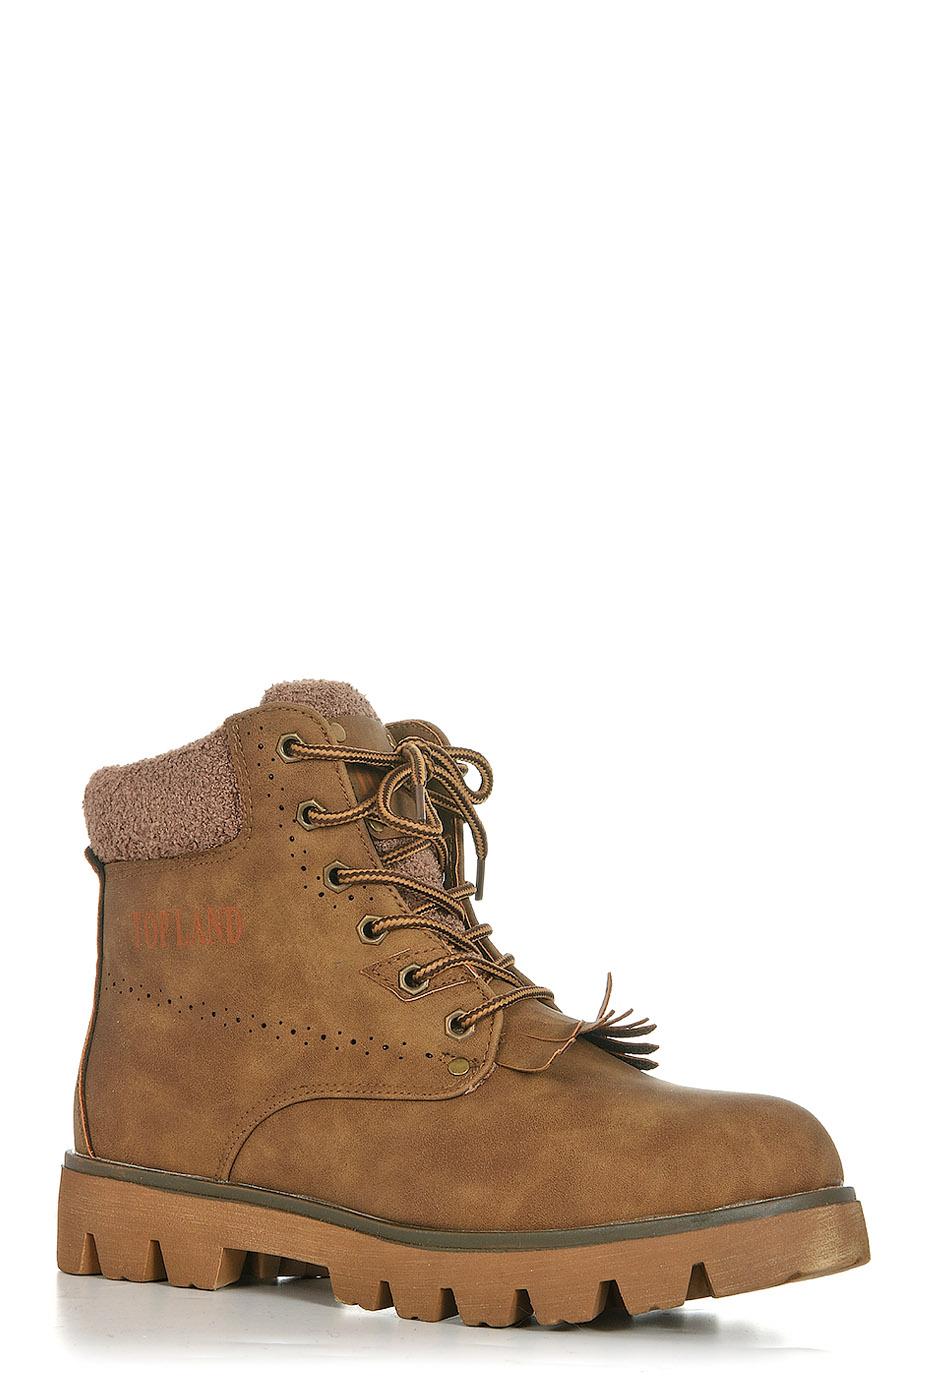 Ботинки TOPLAND2322-PB76187K/CAMEL